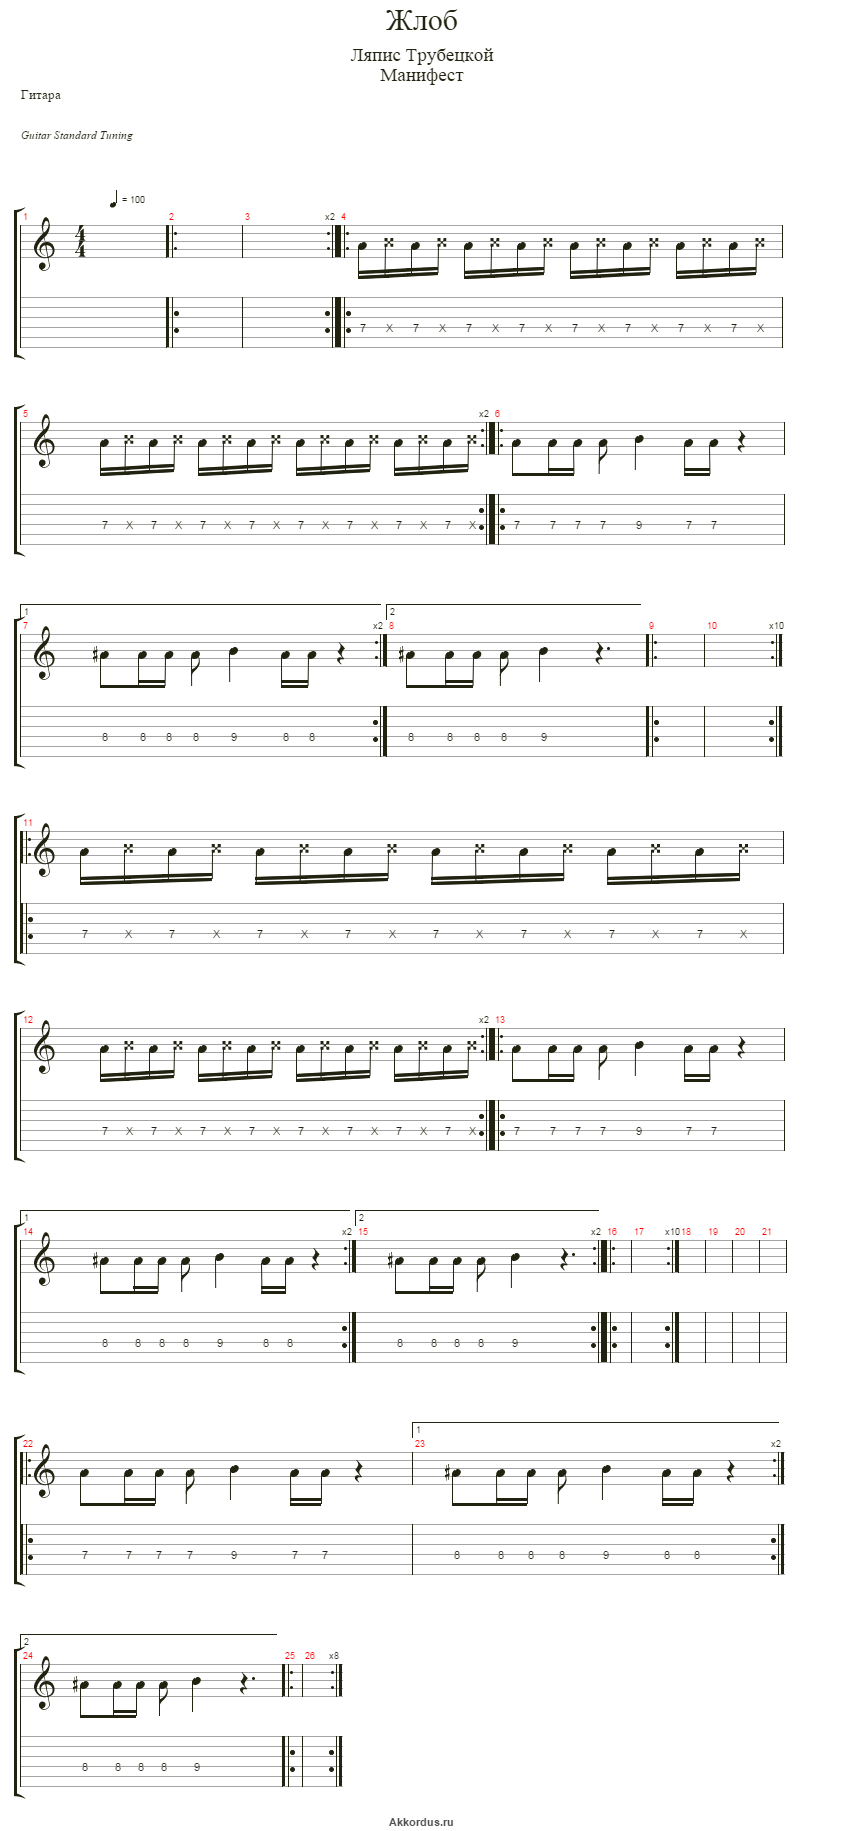 Ляпис трубецкой секс аккорды